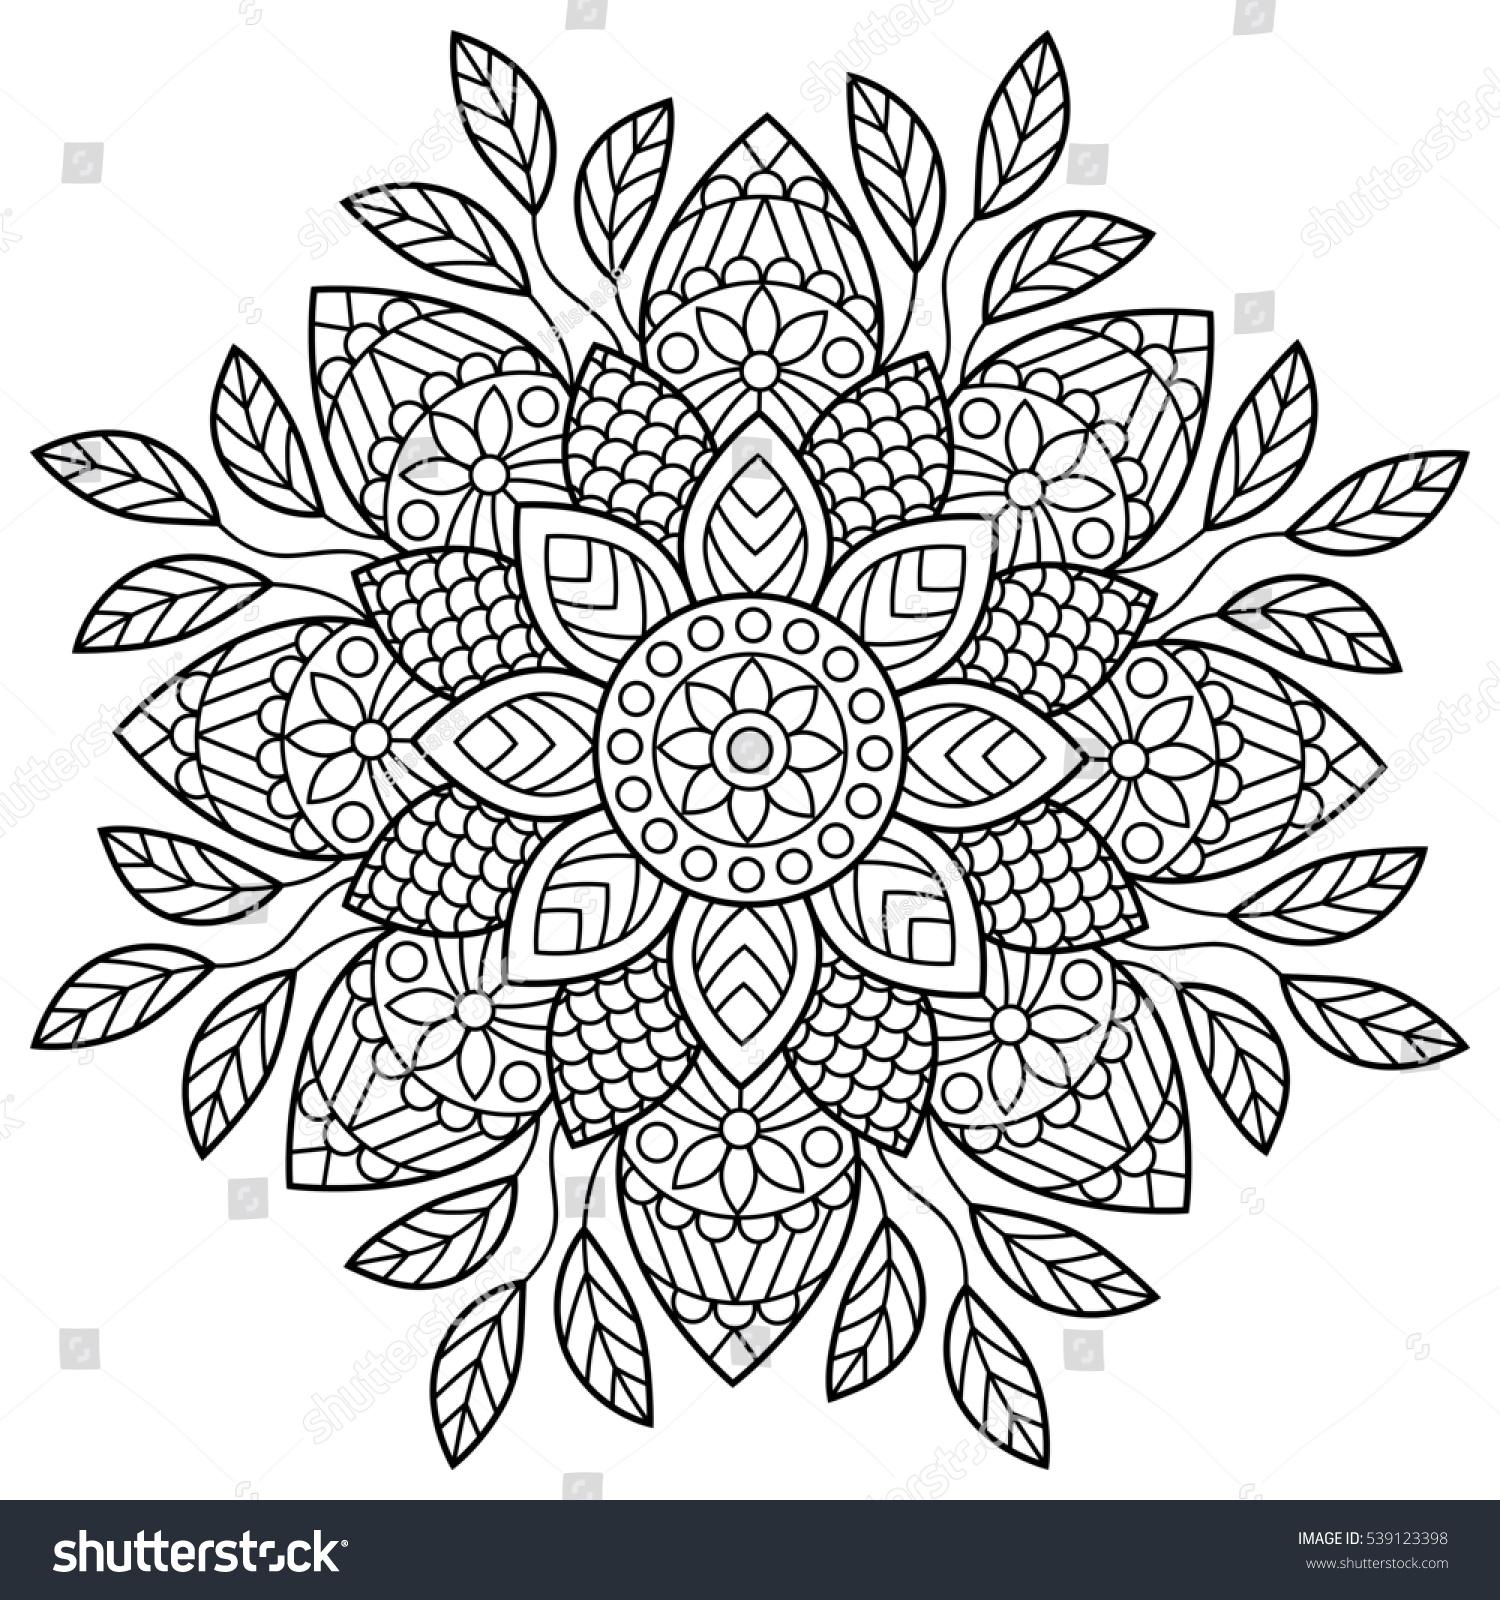 Coloring book pages mandala - Mandala Coloring Book Pages Indian Antistress Medallion Abstract Islamic Flower Arabic Henna